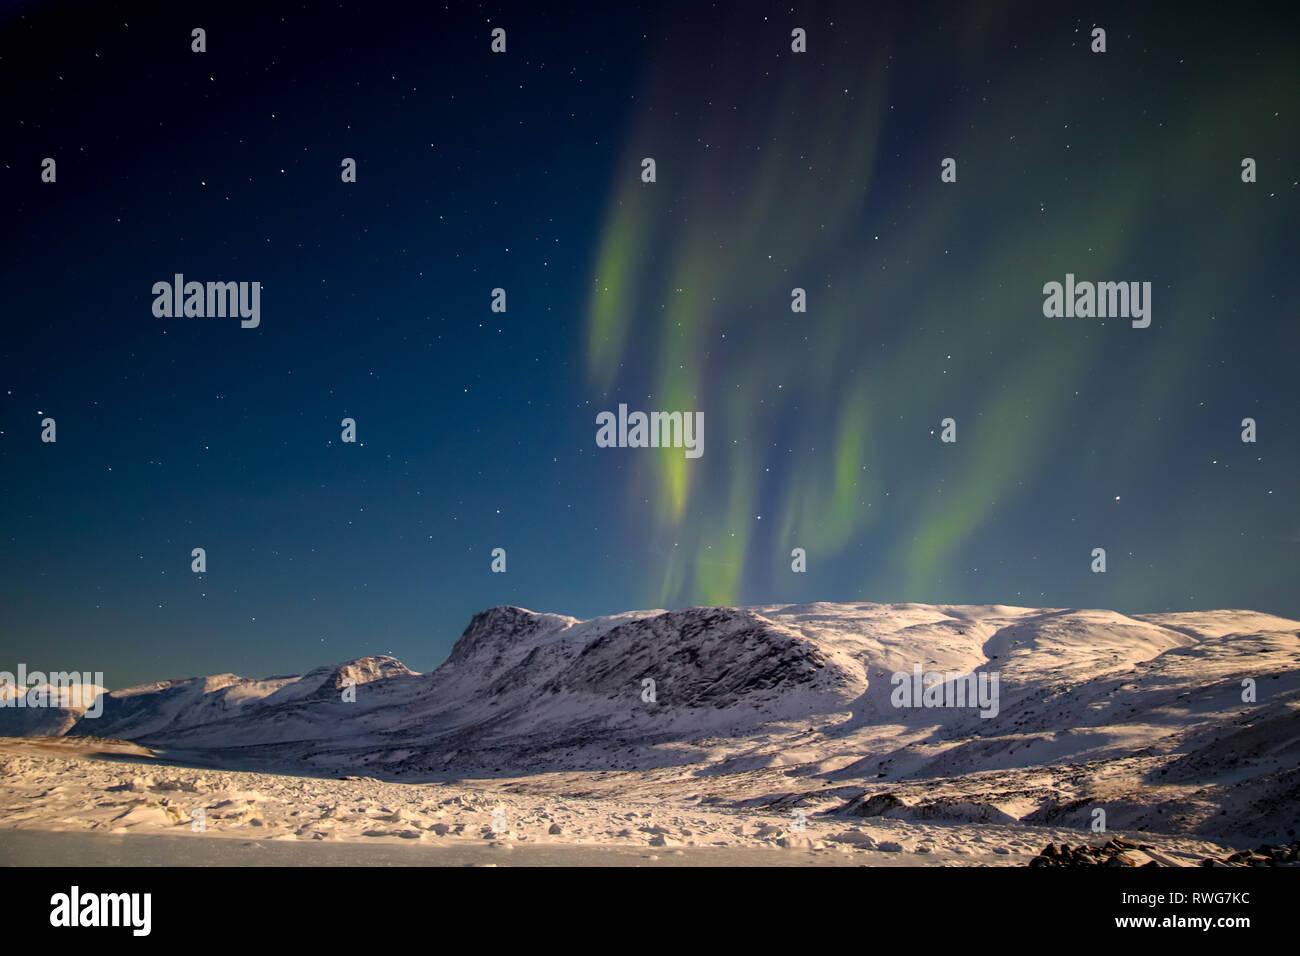 blood moon january 2019 saskatchewan - photo #49